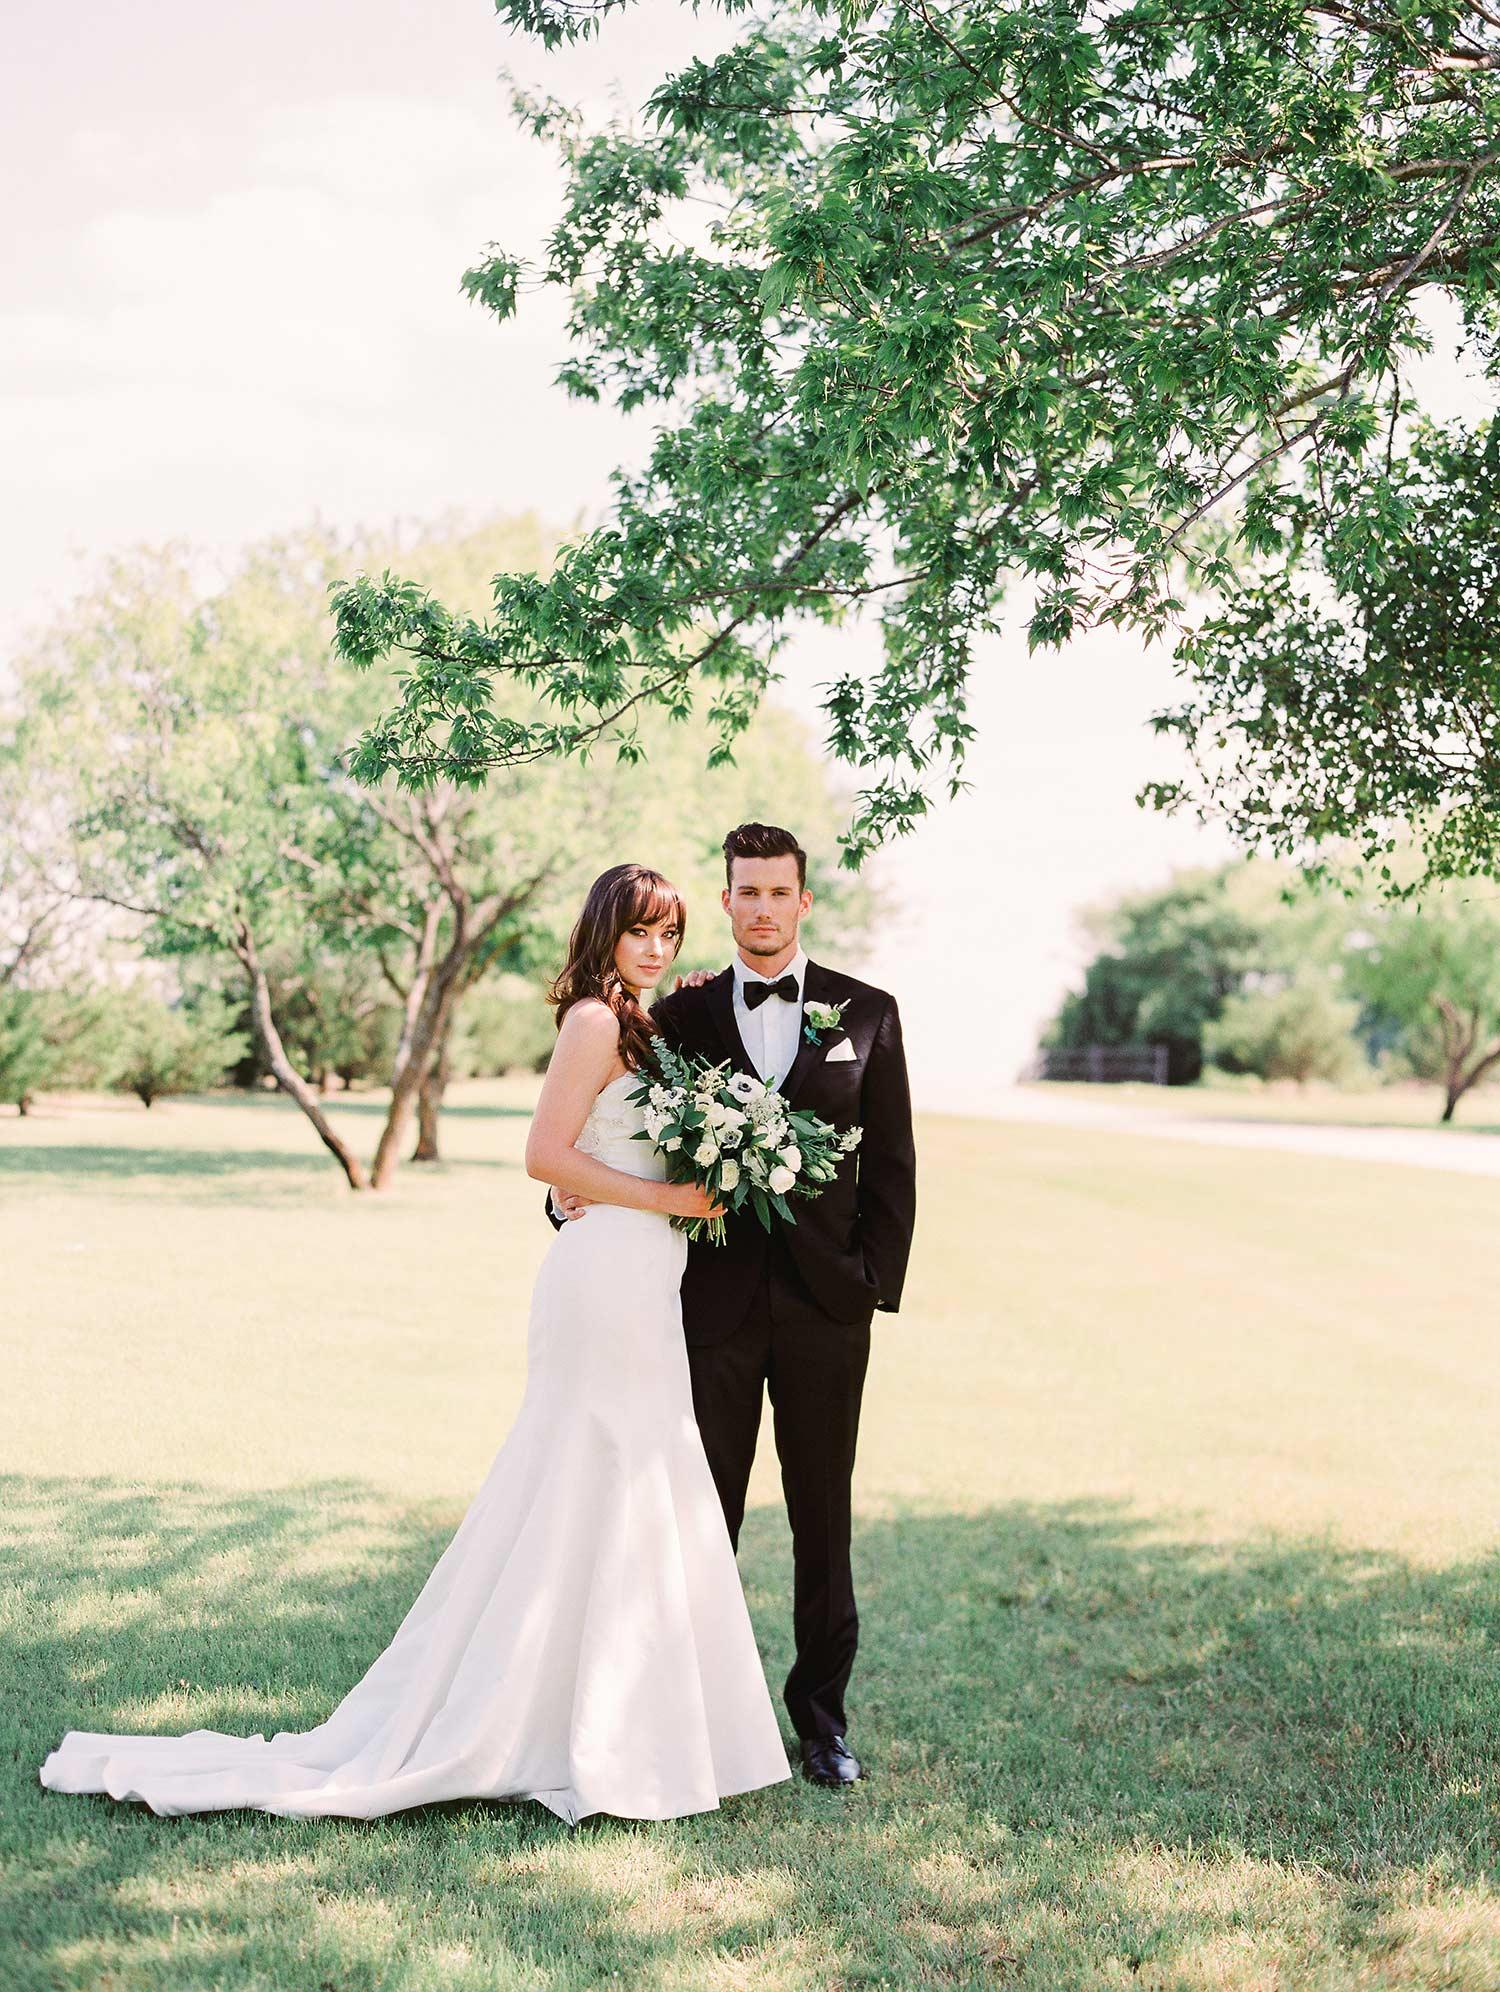 Bride in long satin dress standing outside with groom in black tuxedo